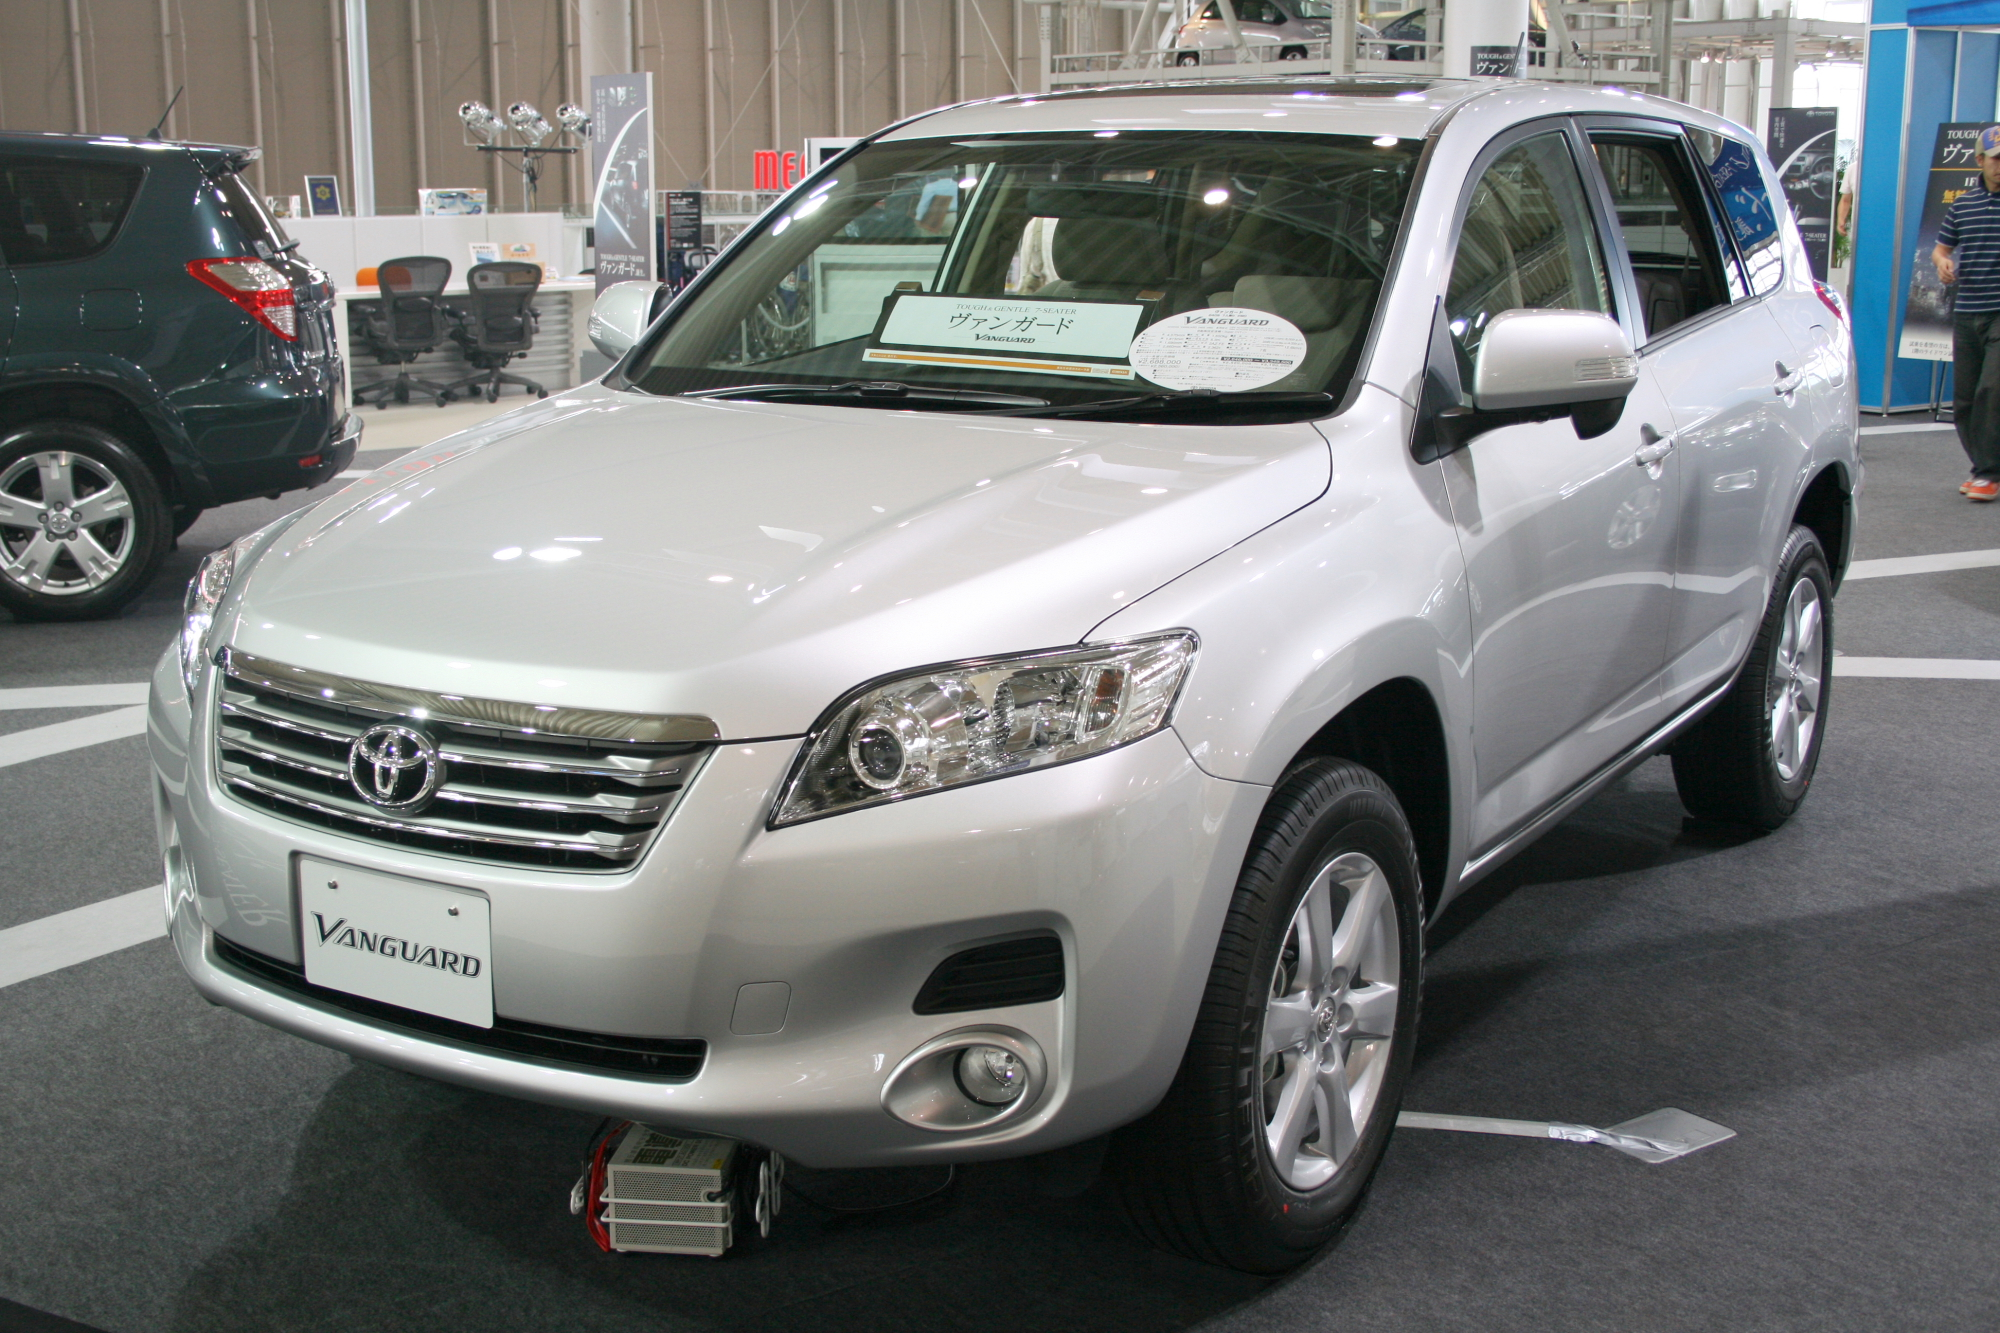 File:Toyota Vanguard.JPG - Wikimedia Commons